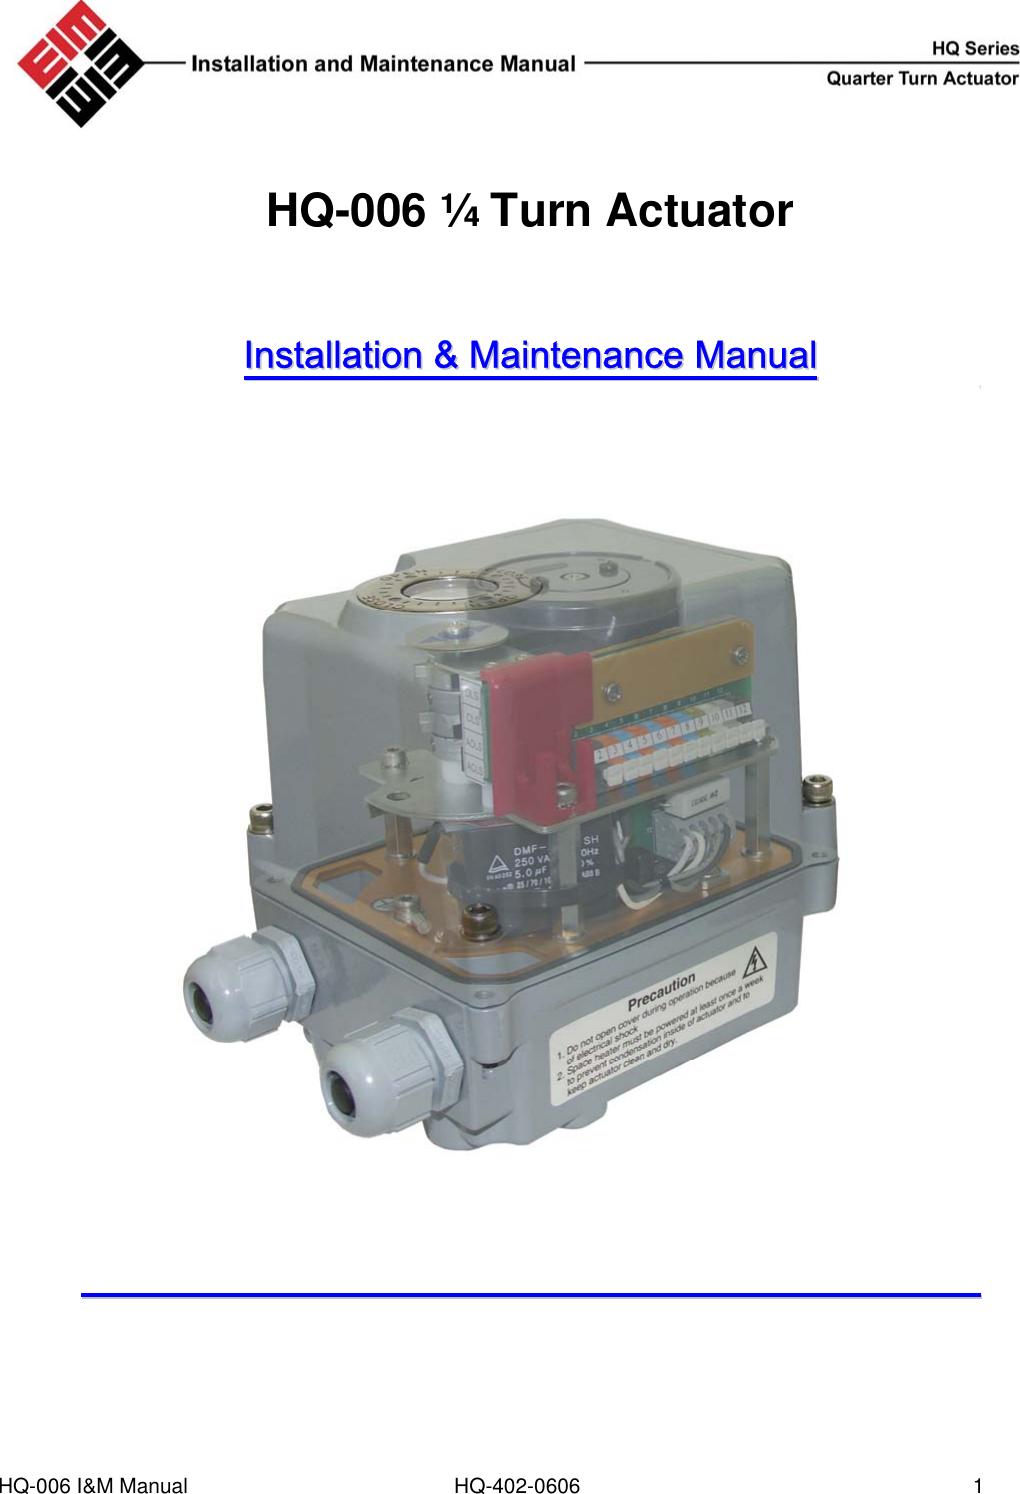 Hq Automobile Parts 402 0606 Users Manual Eim Actuator Wiring Diagram